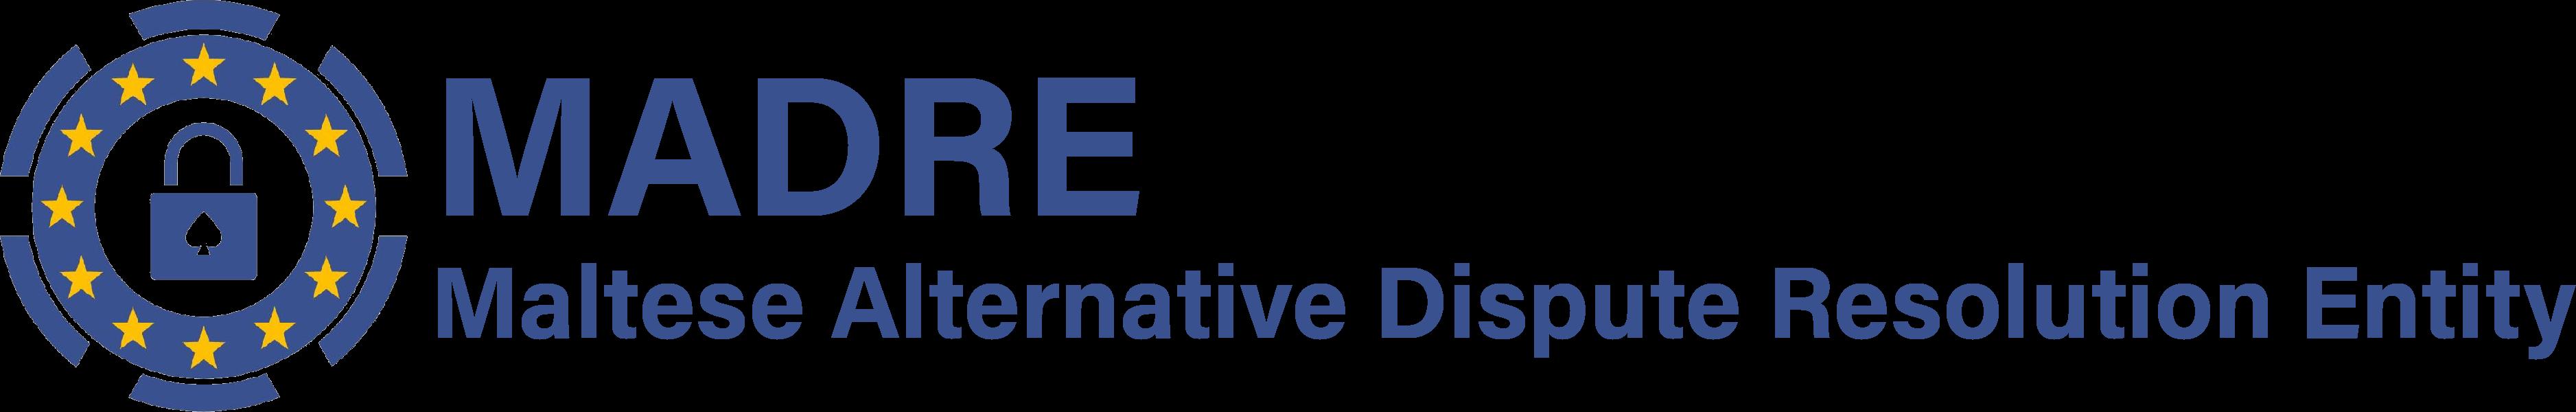 MADRE – Maltese Alternative Dispute Resolution Entity